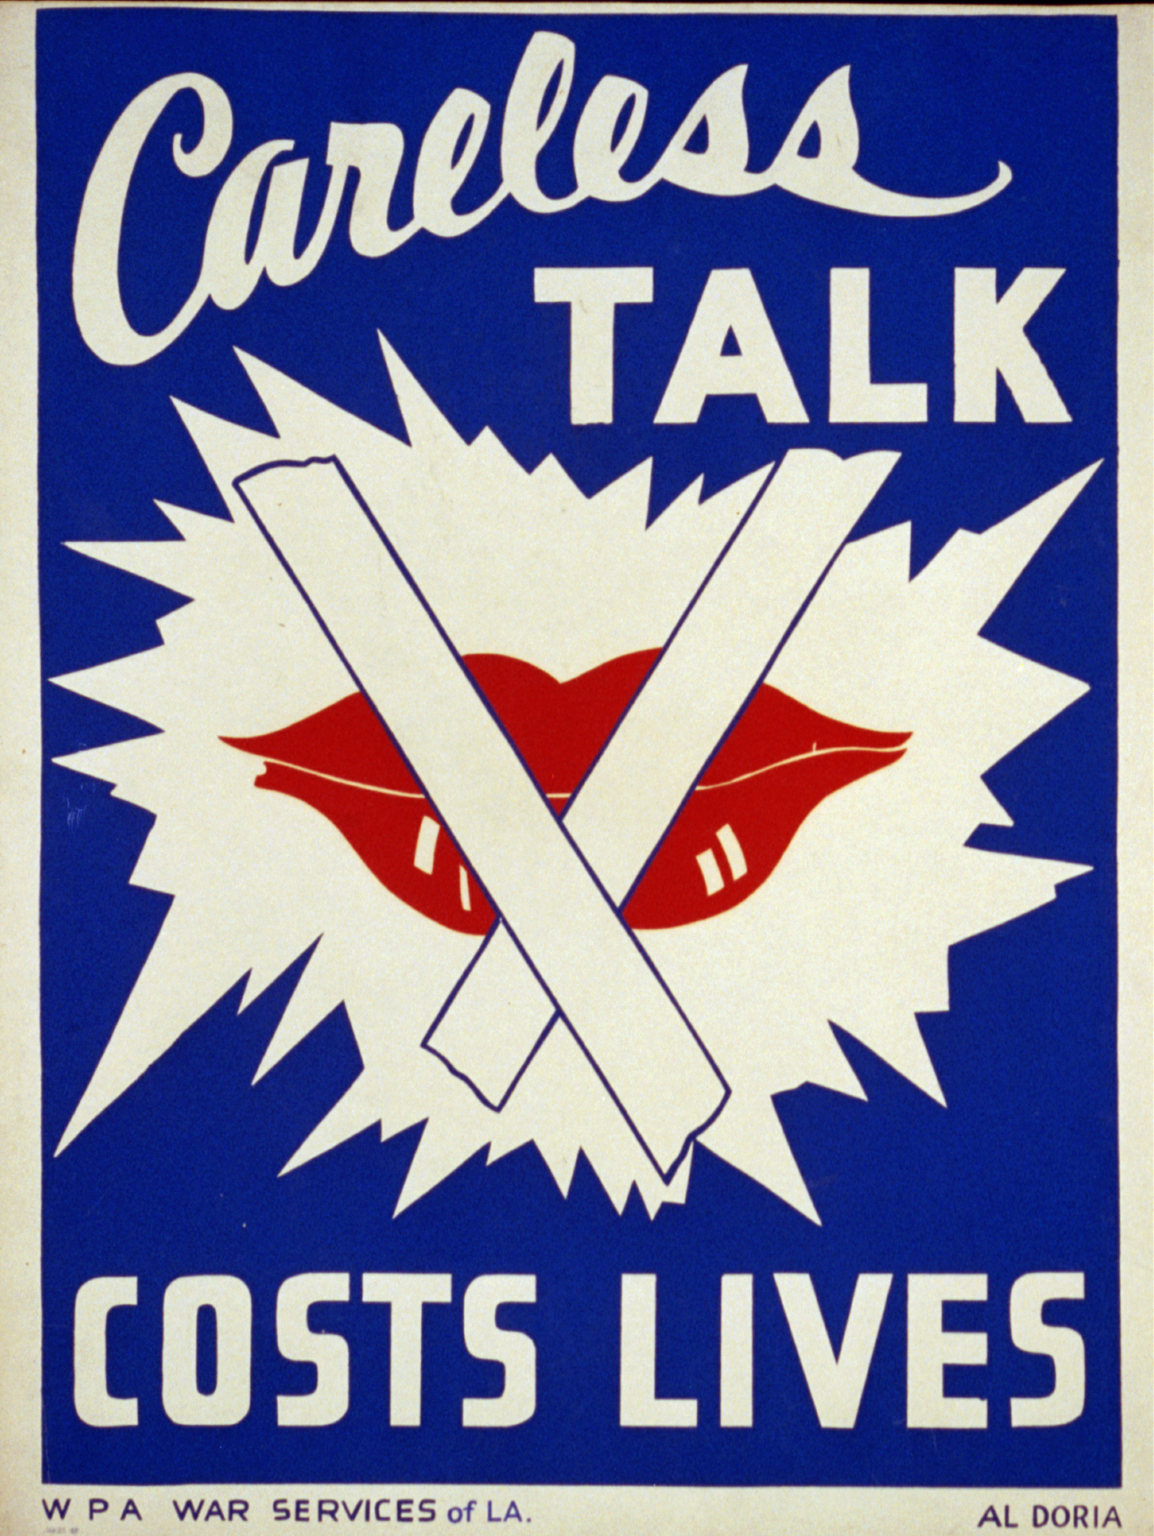 Careless Talk Costs Lives Us 1943 Propaganda Posters Propaganda Life